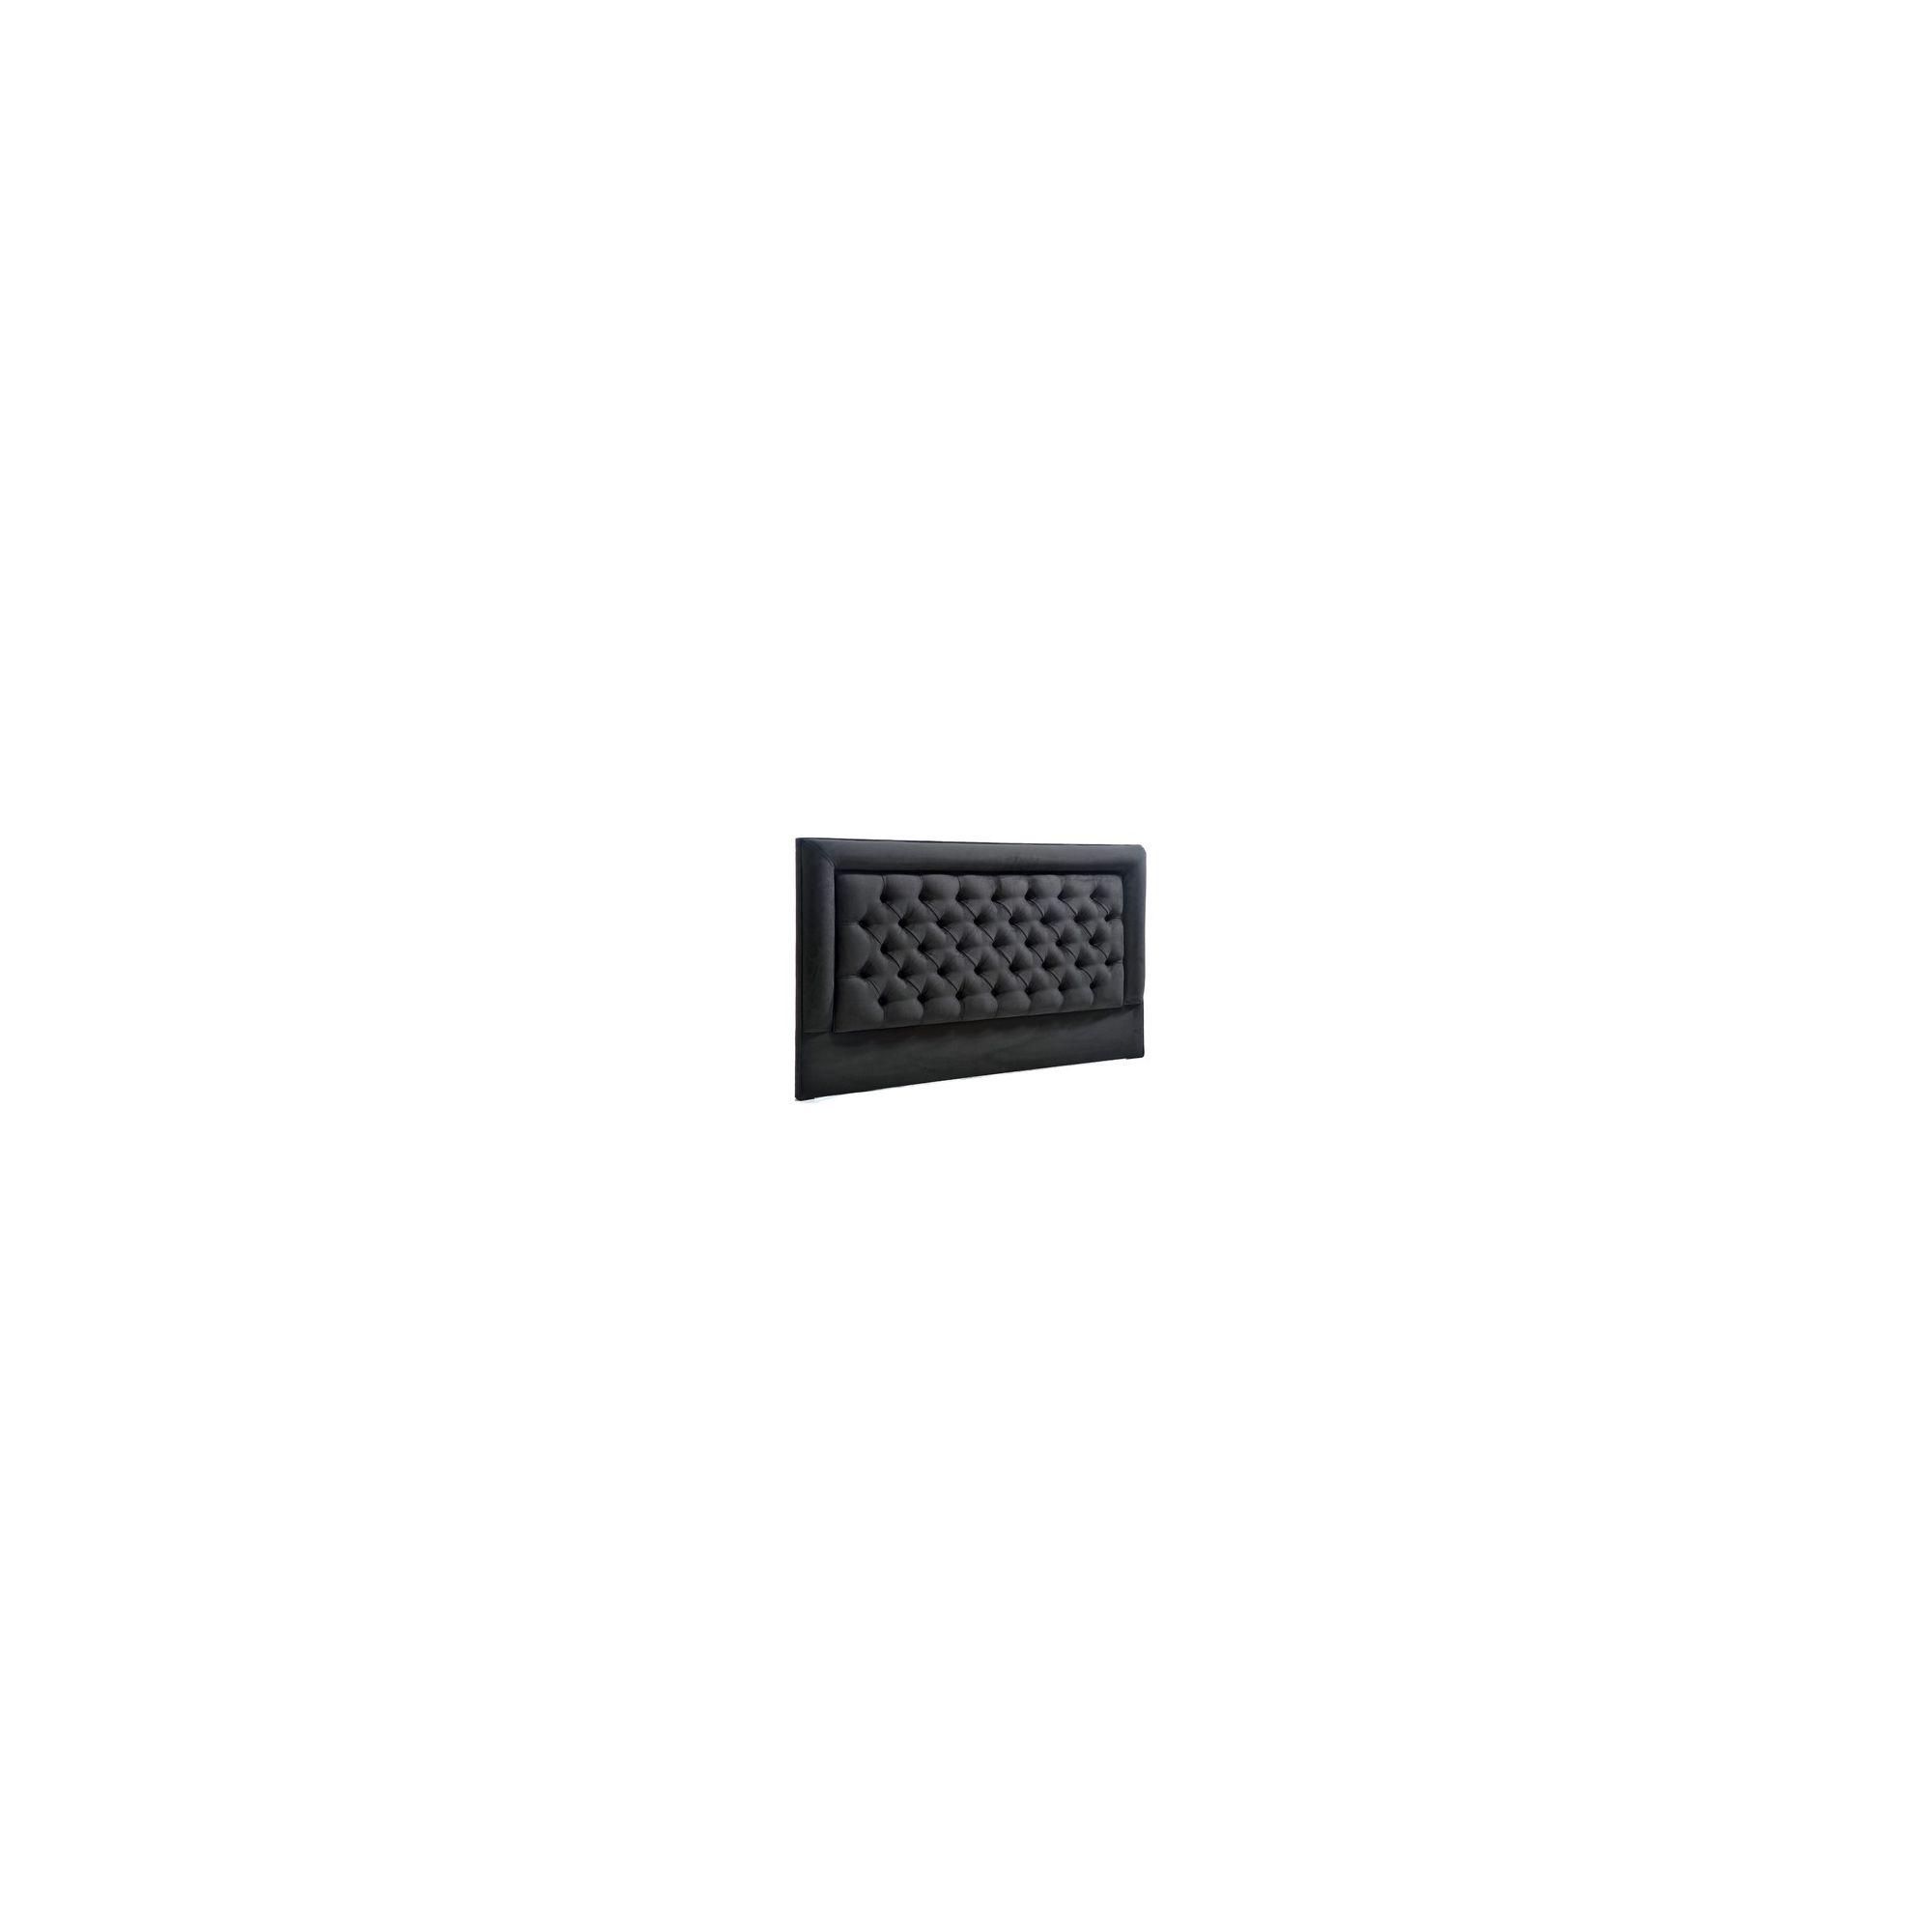 PC Upholstery Brasilia Headboard - Ecru - 3' Single at Tesco Direct